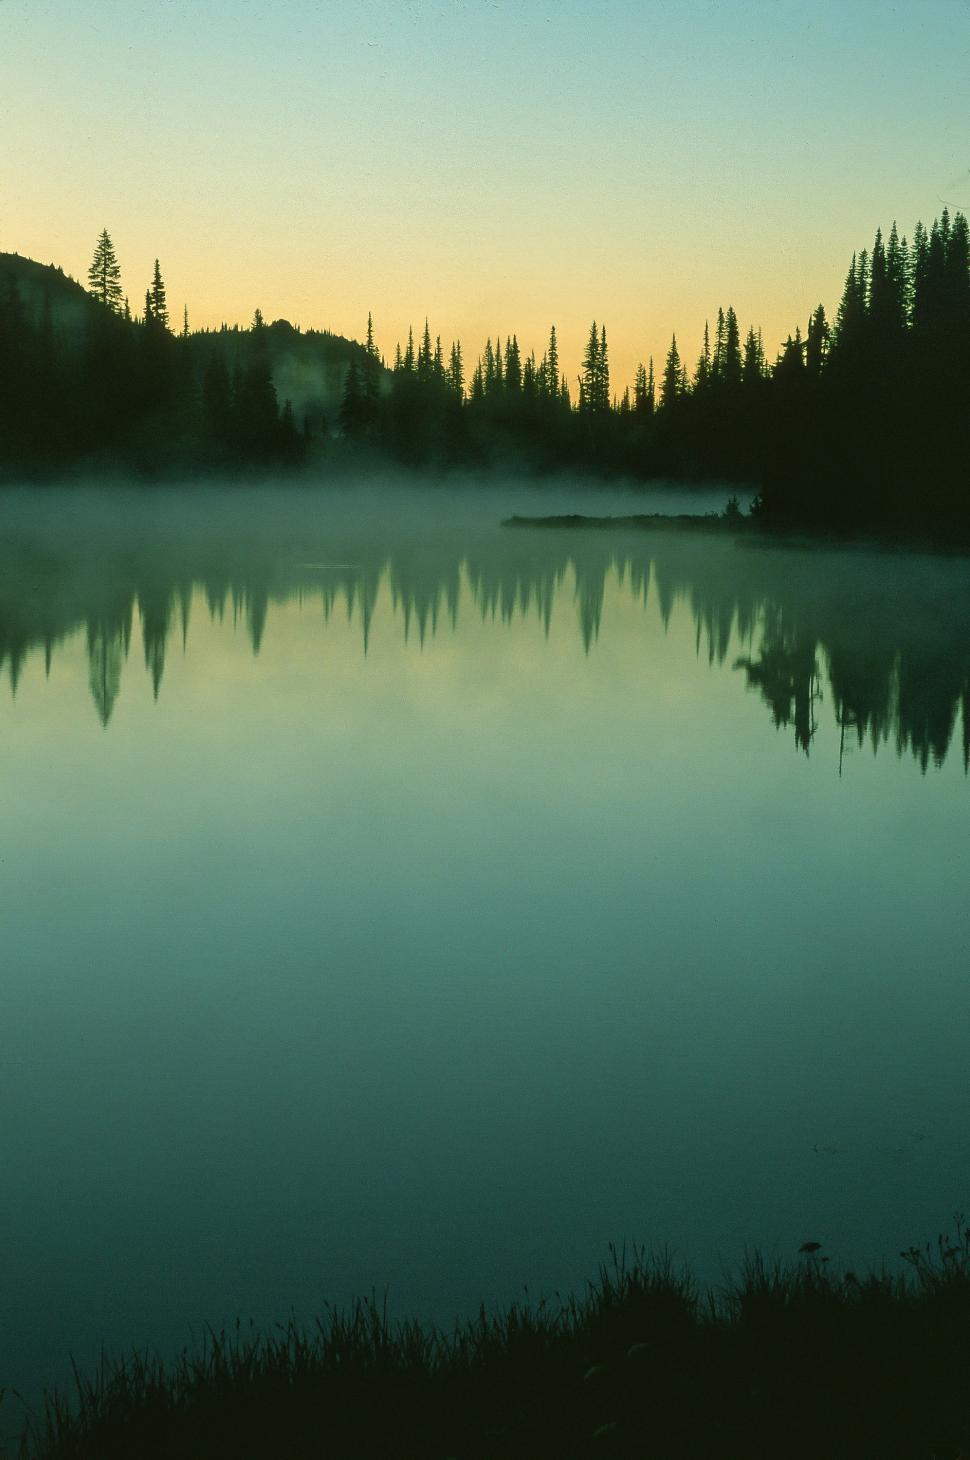 Download Free Stock HD Photo of Reflection Lake, Mount Rainier  Online